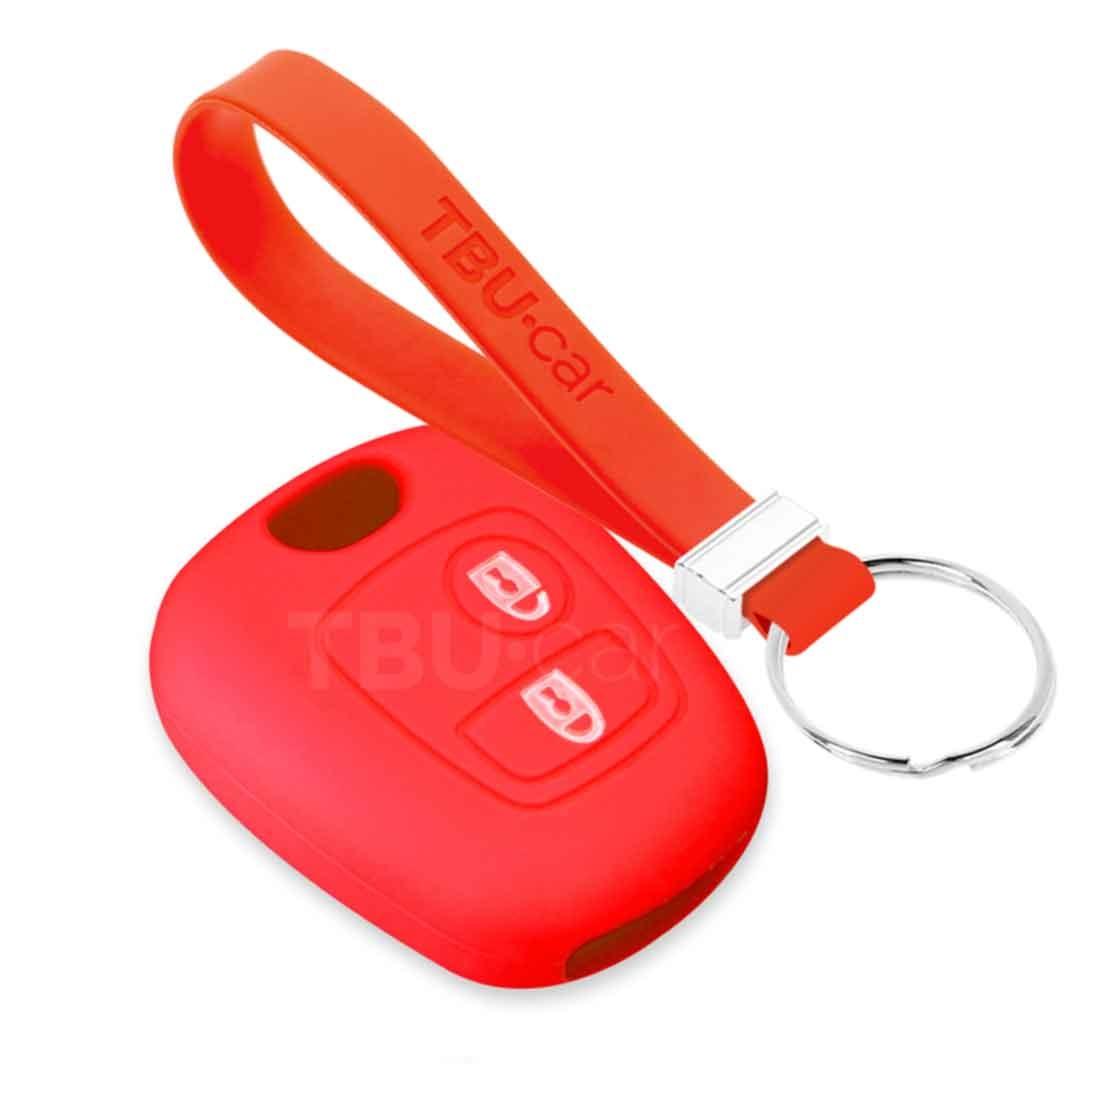 TBU car TBU car Sleutel cover compatibel met Toyota - Silicone sleutelhoesje - beschermhoesje autosleutel - Rood